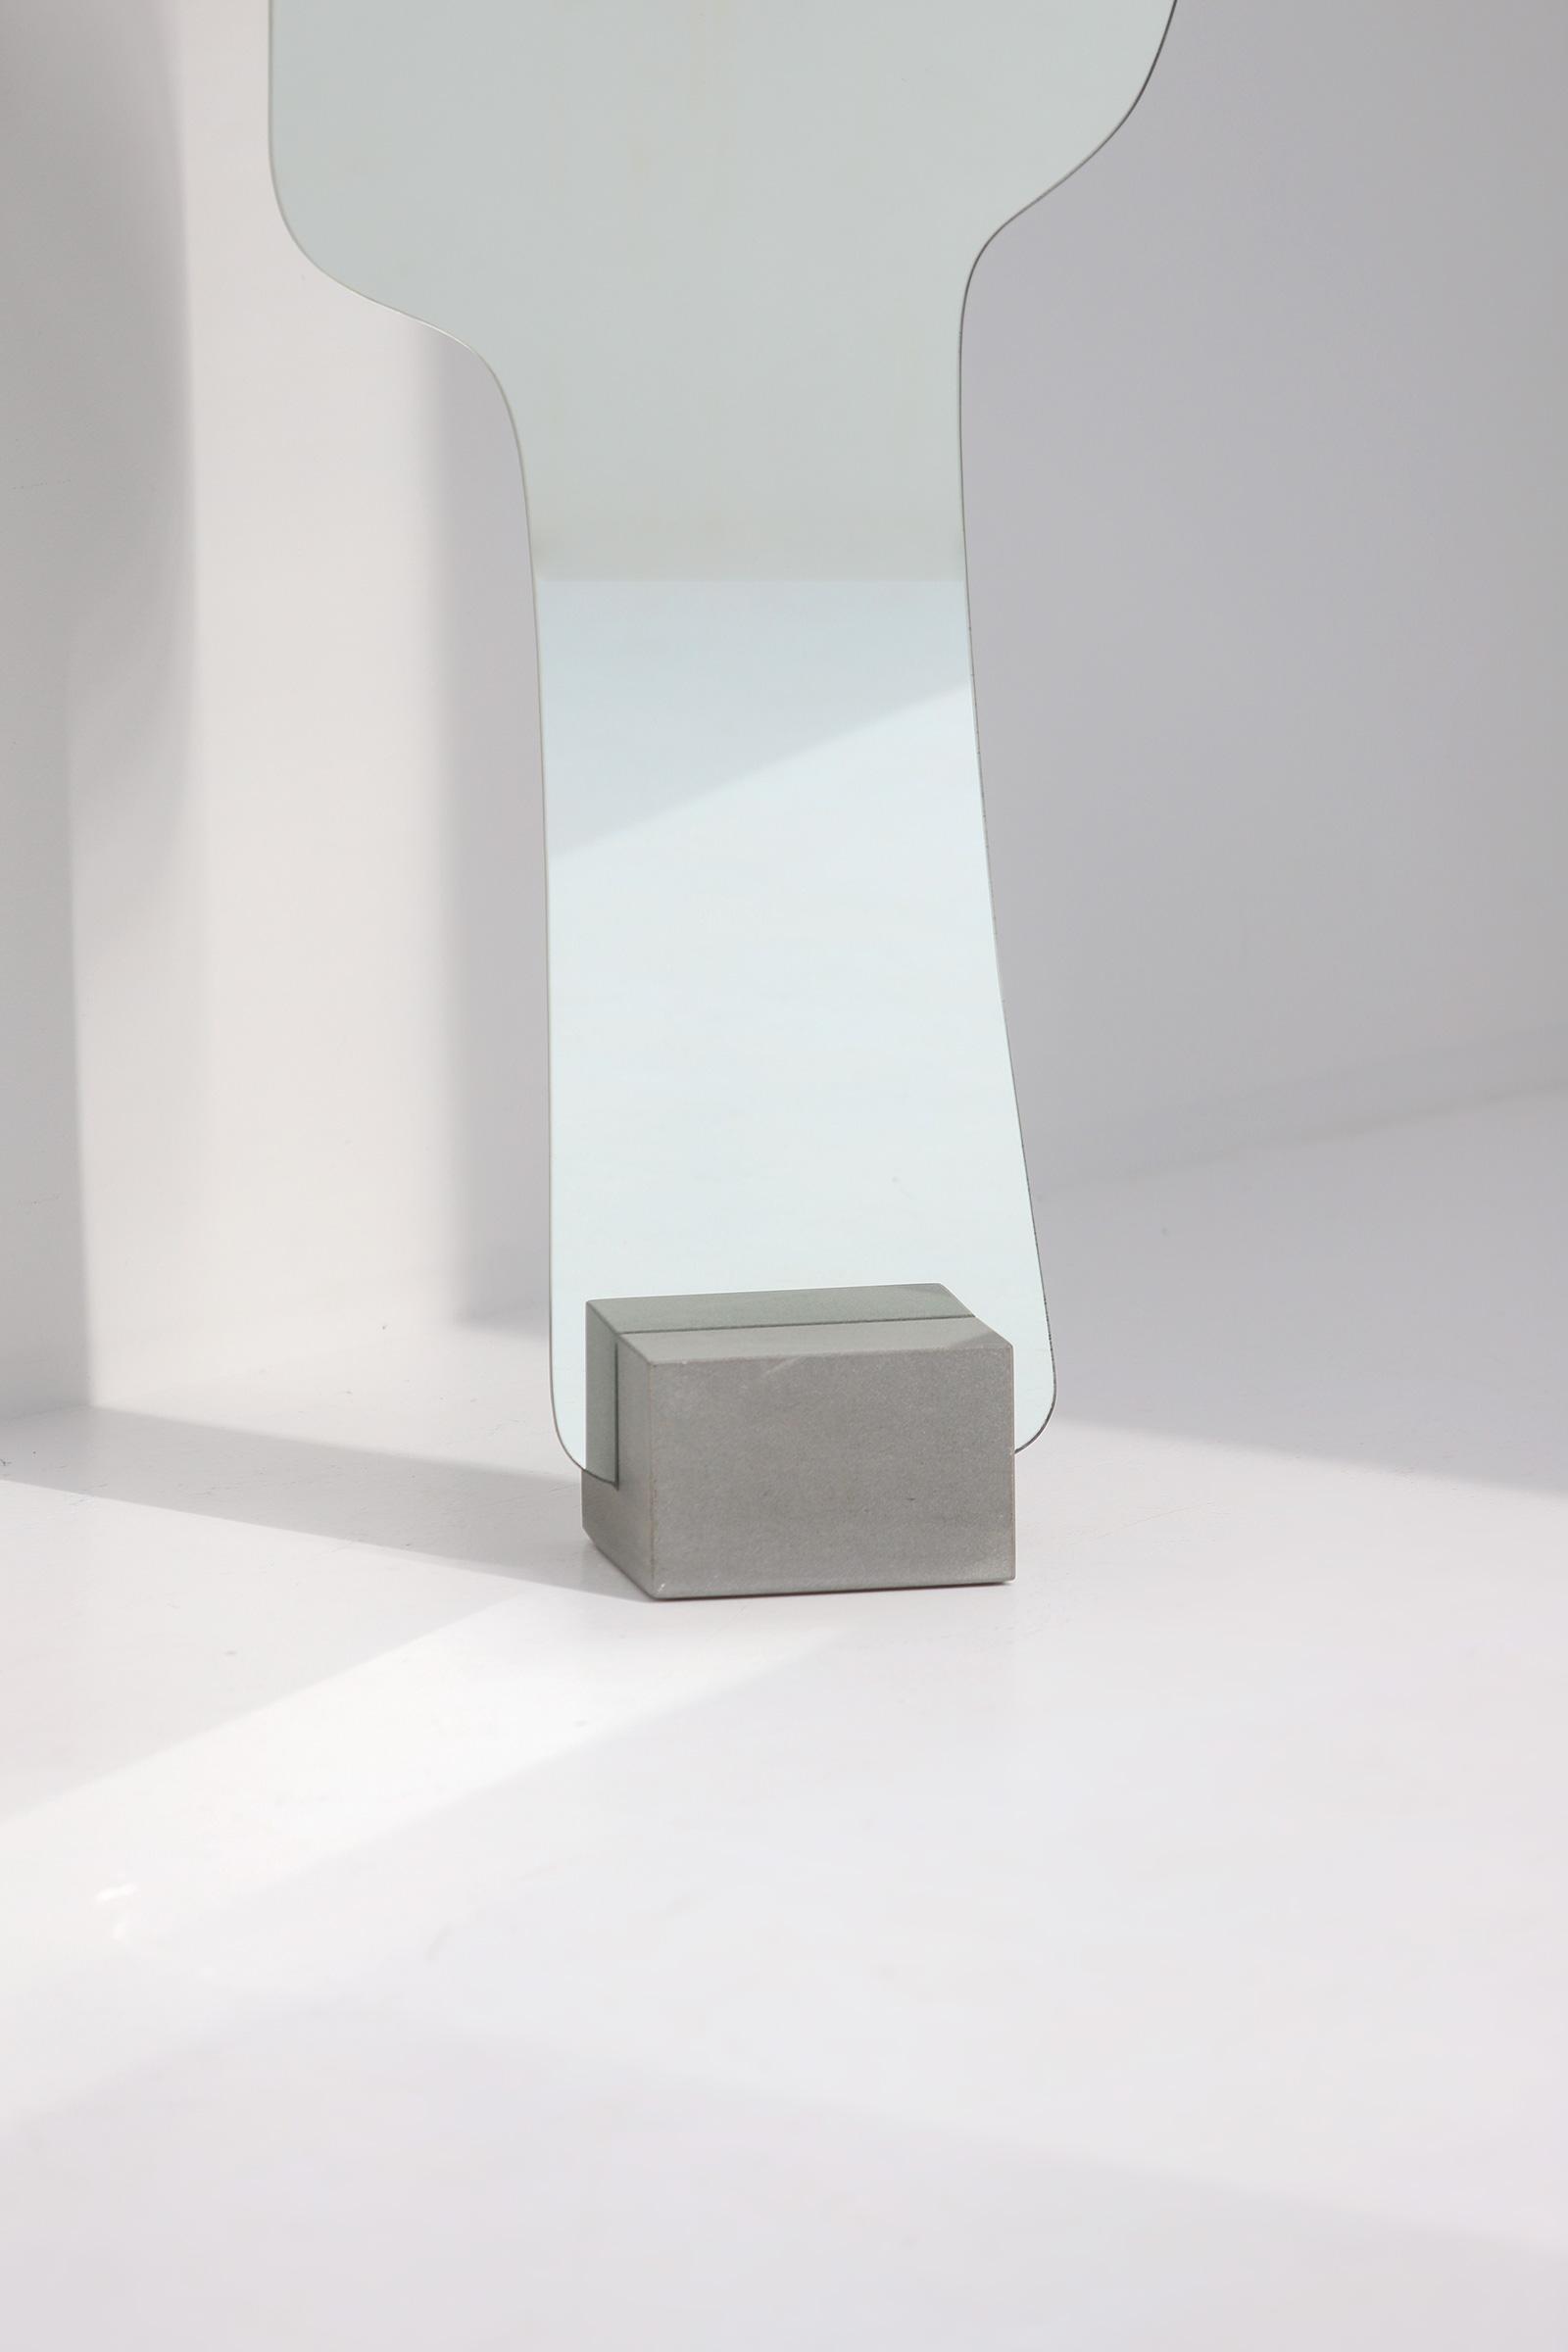 Pierre Cardin Silhouette shaped mirrorimage 3